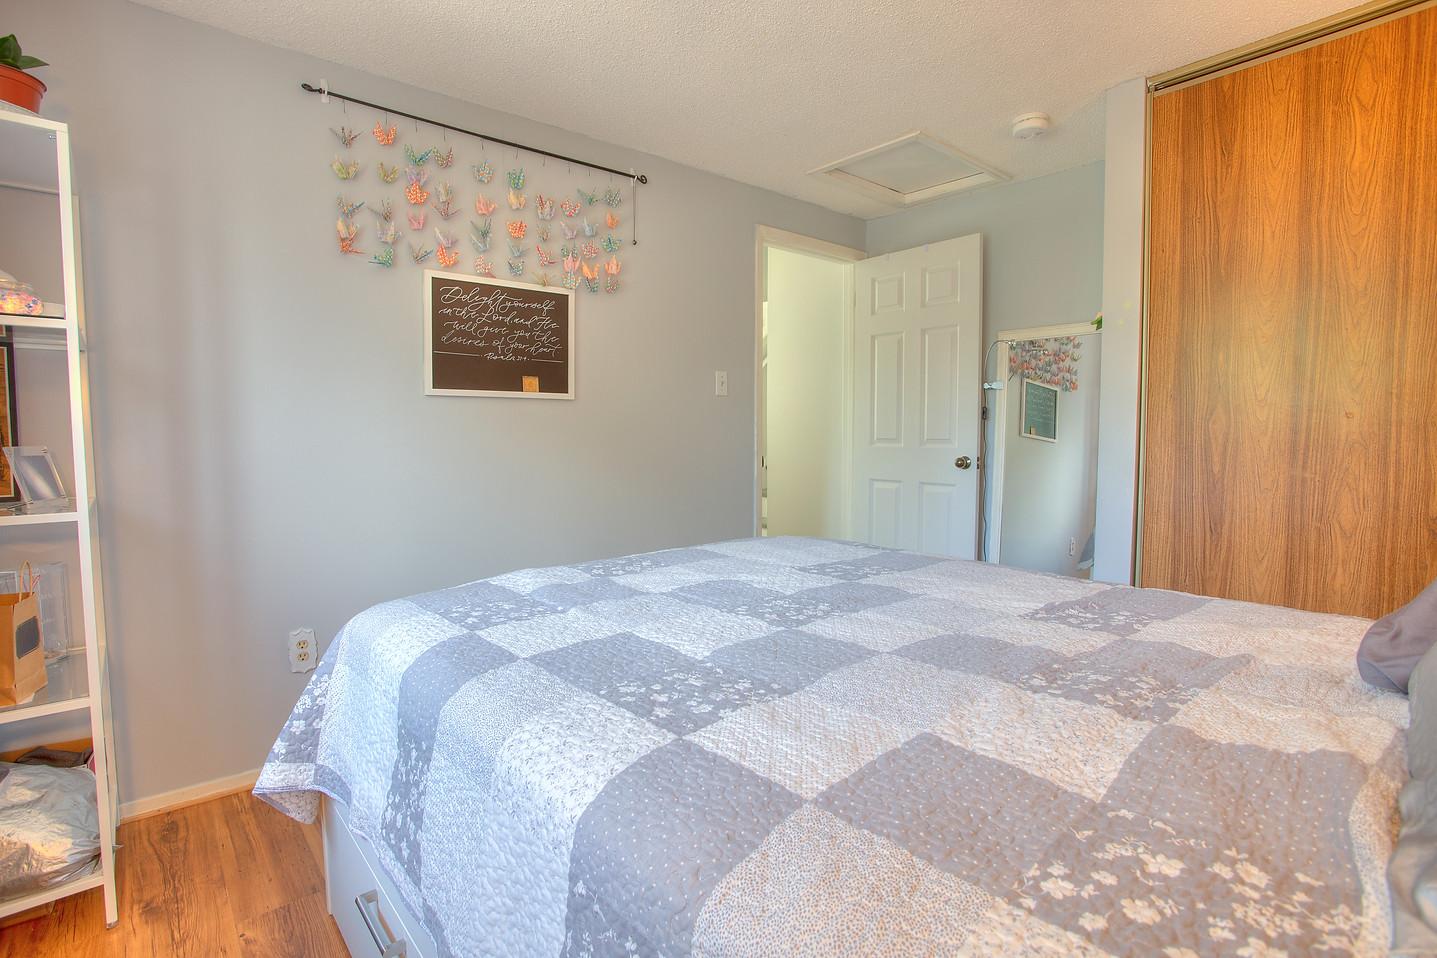 Bedroom 15.jpeg